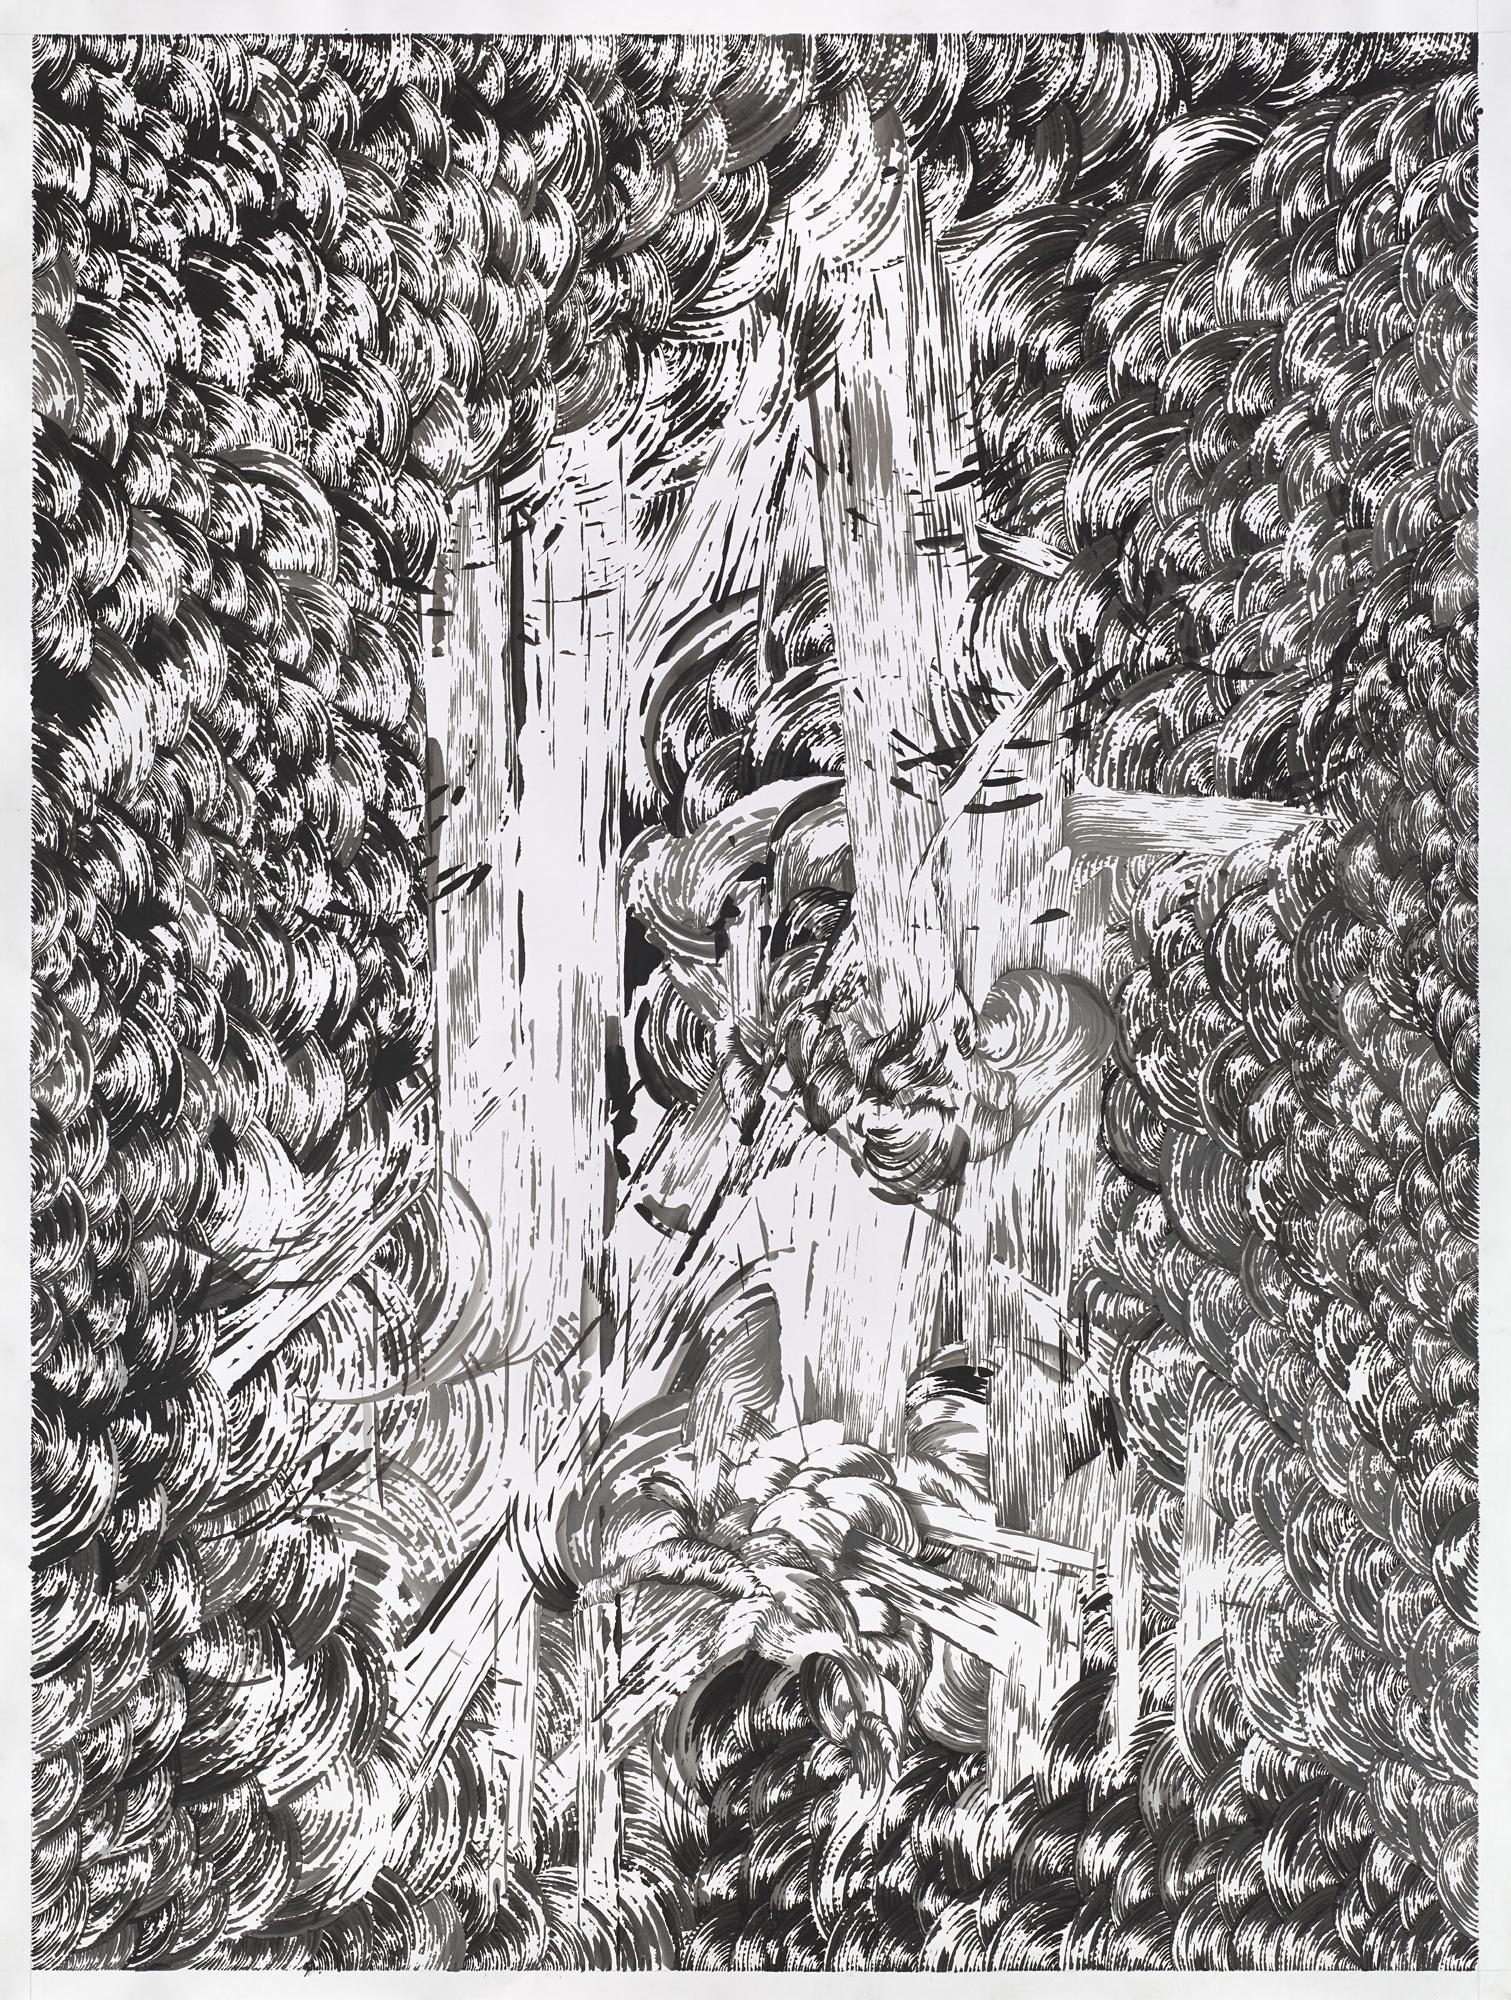 BK P164 2 | untitled | ink on paper | 200x150cm | 2014